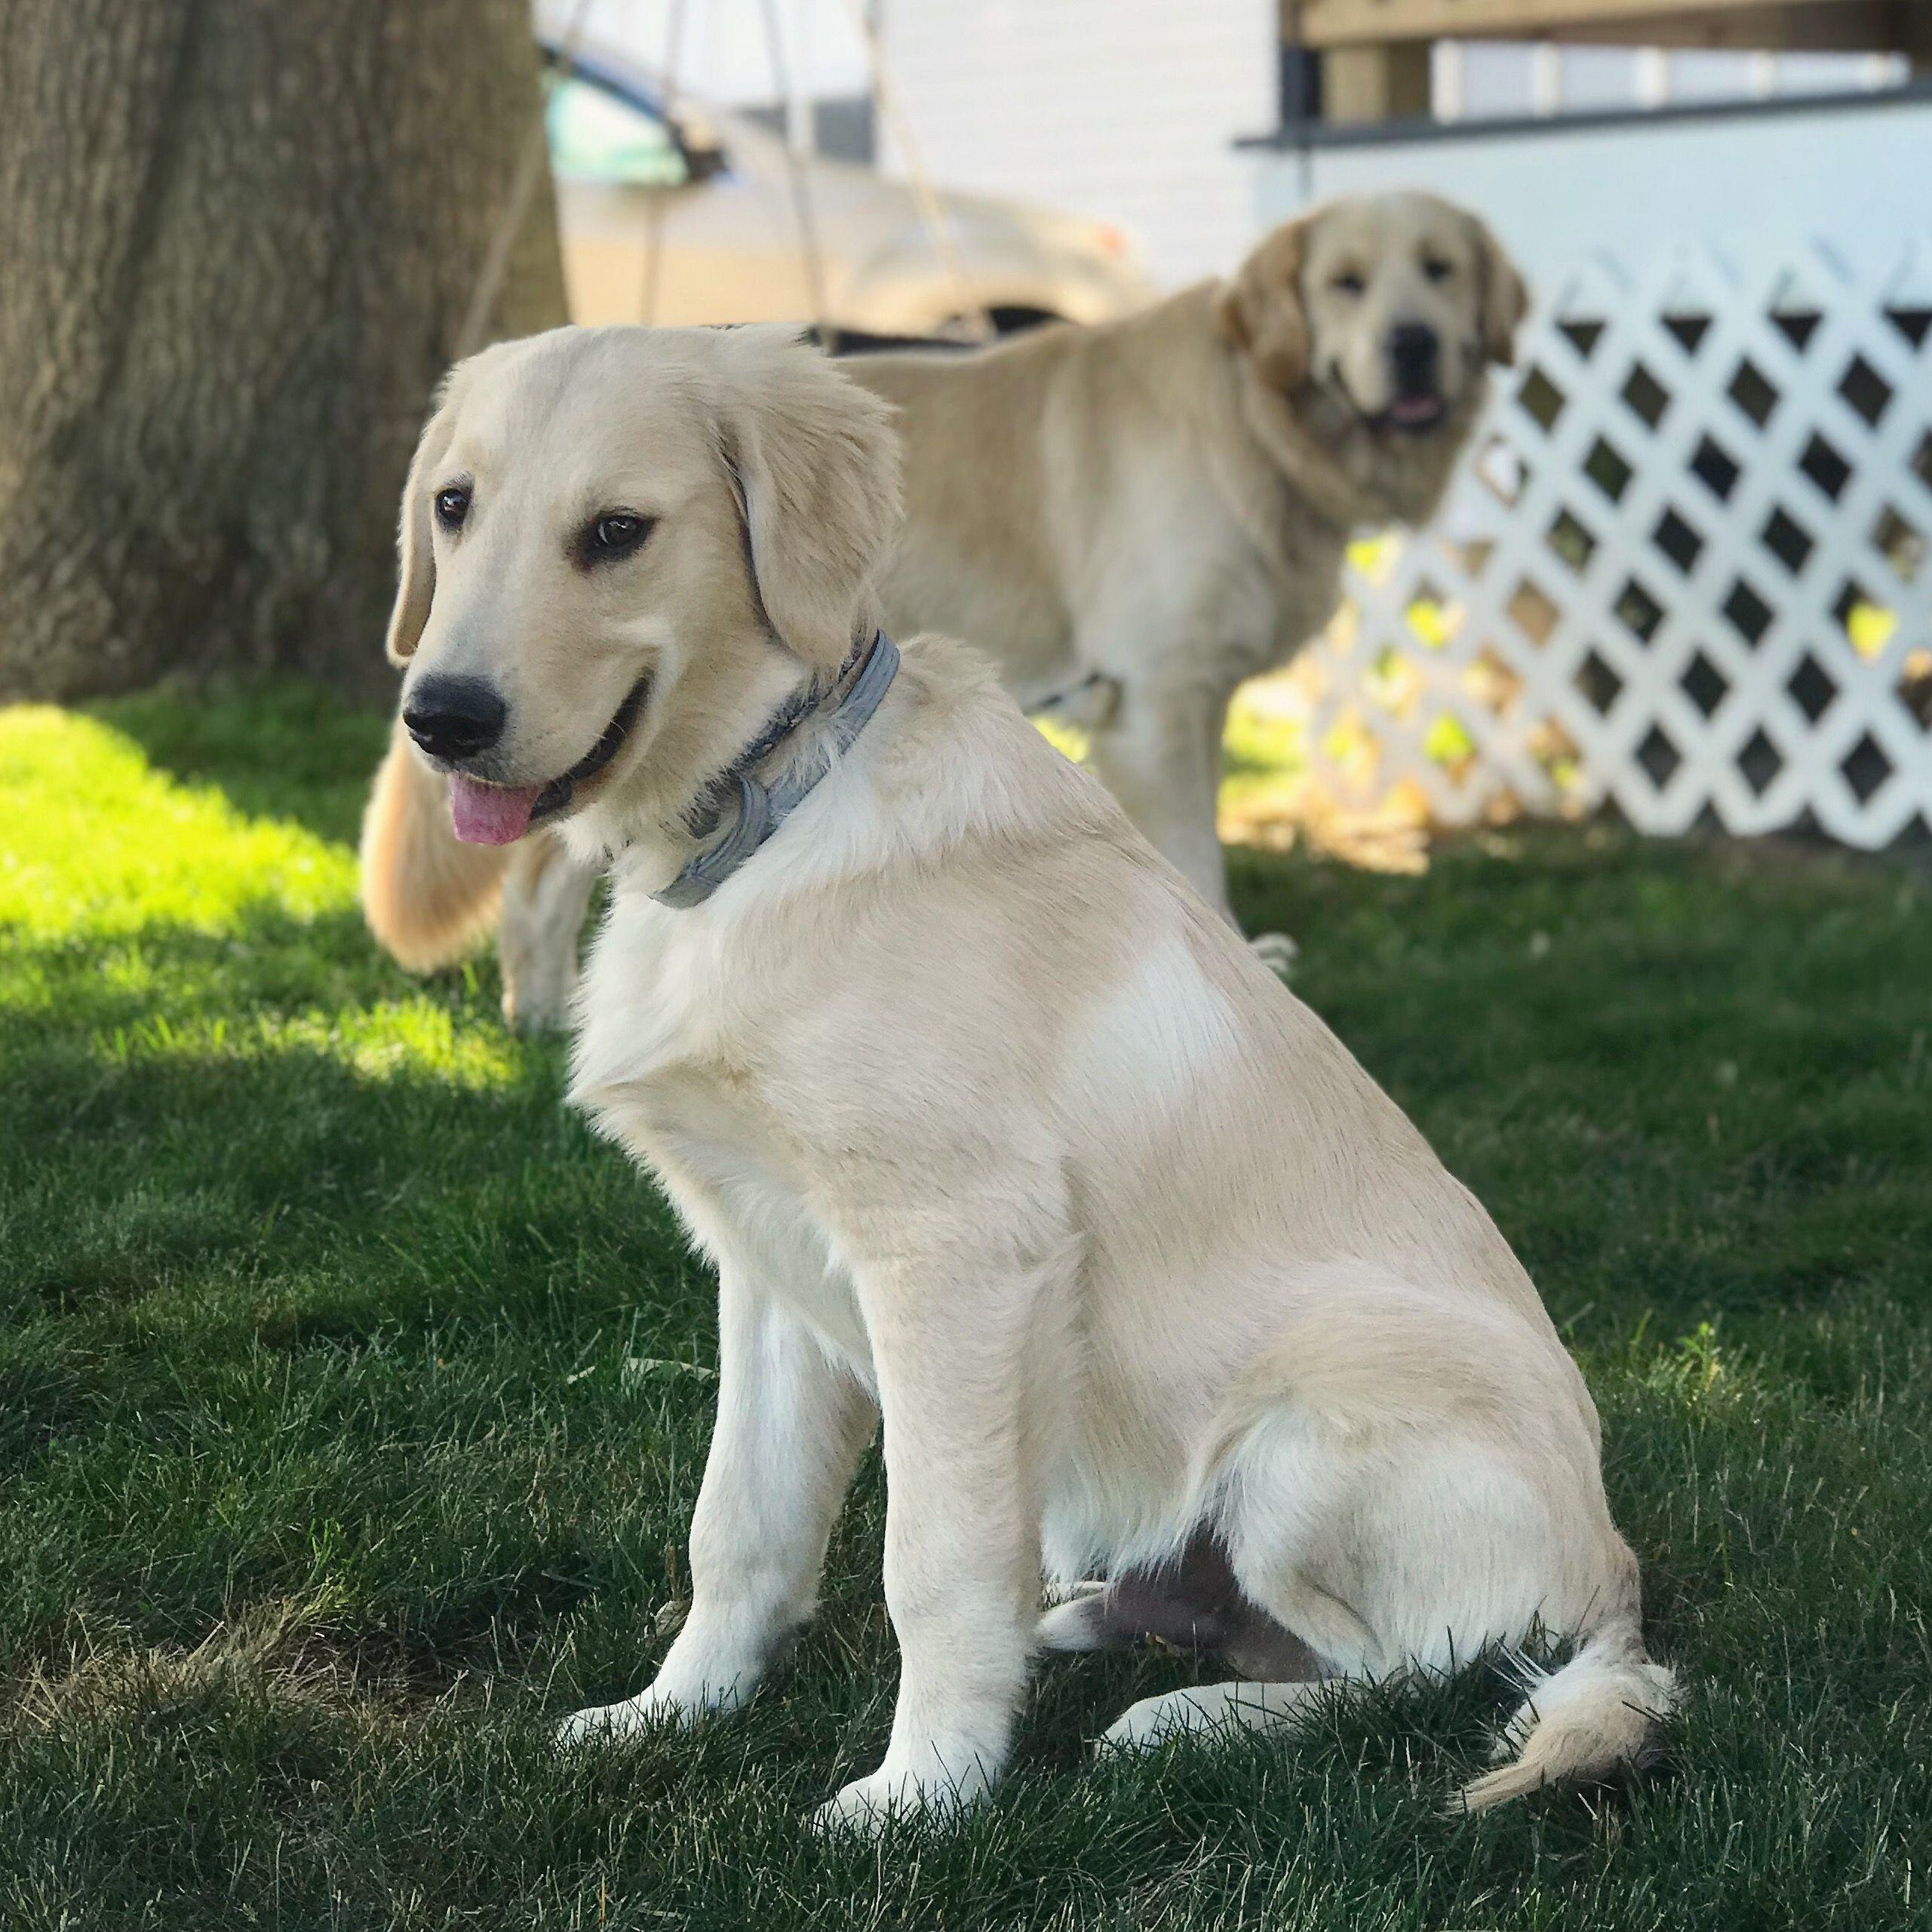 Jasperthefriendlygolden And Joyful Jax Golden Retriever Puppies